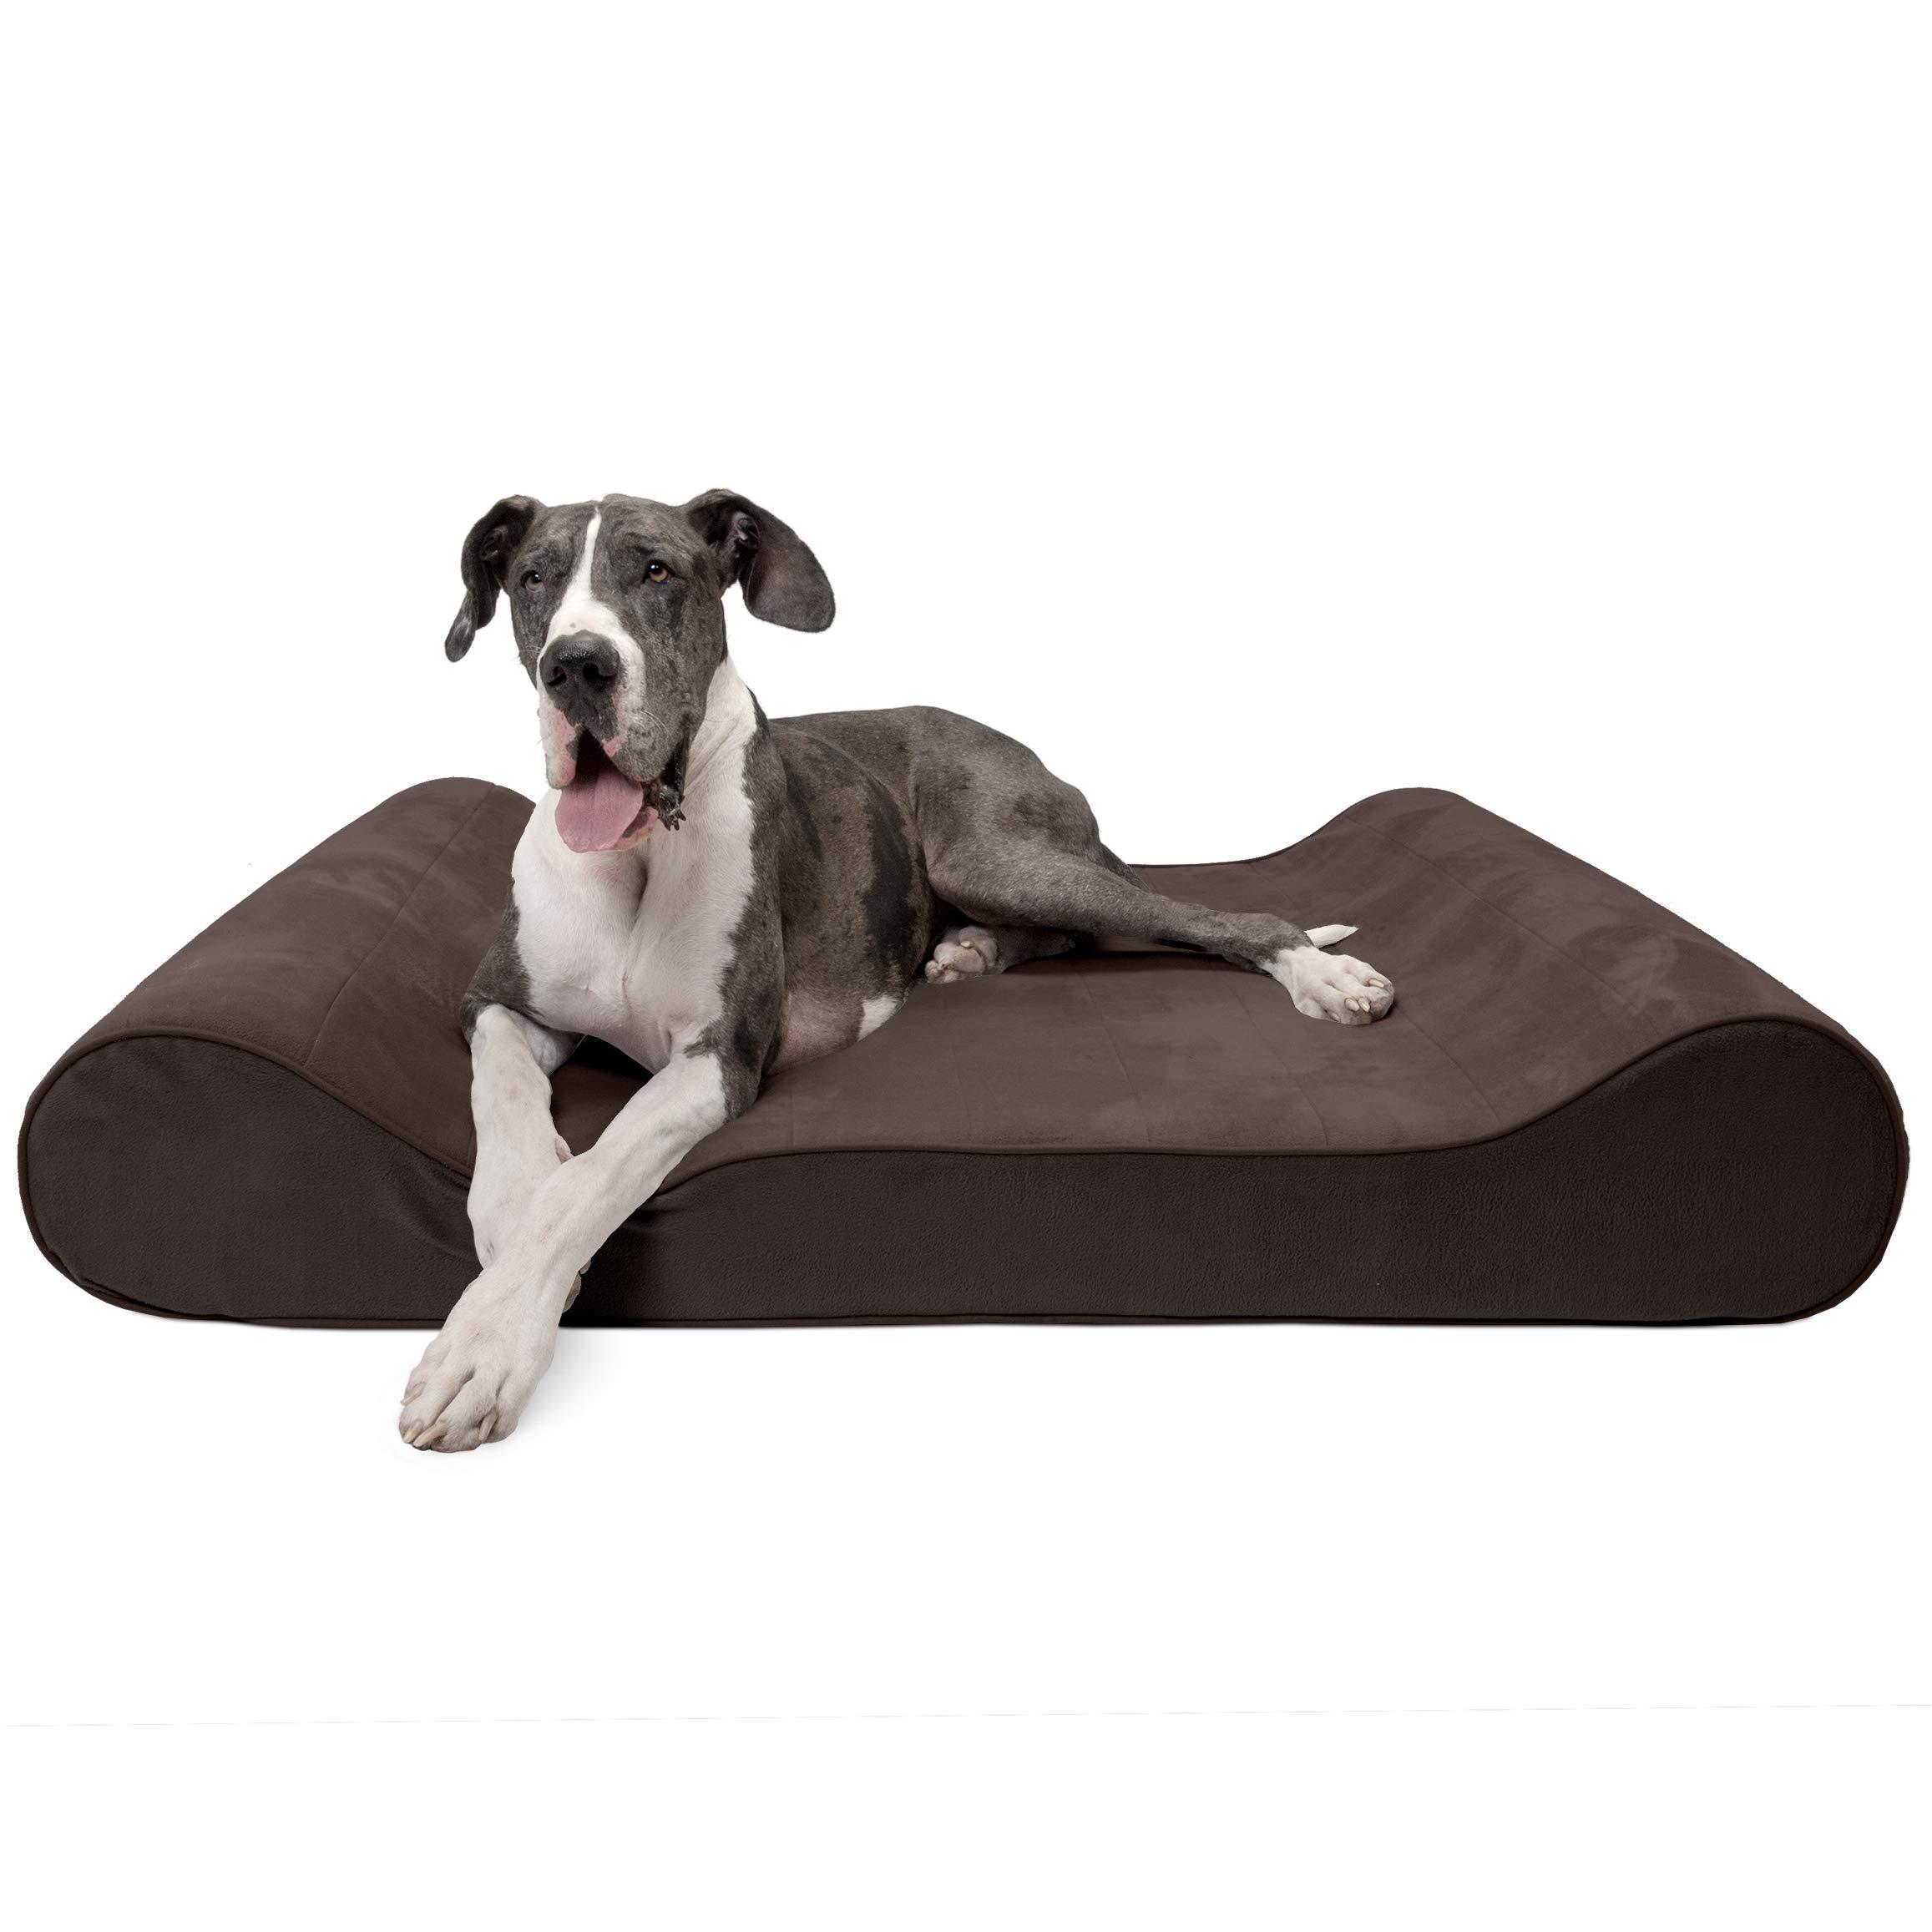 Furhaven Pet Dog Bed | Memory Foam Micro Velvet Ergonomic Luxe Lounger Cradle Mattress Contour Pet Bed for Dogs & Cats, Espresso, Giant